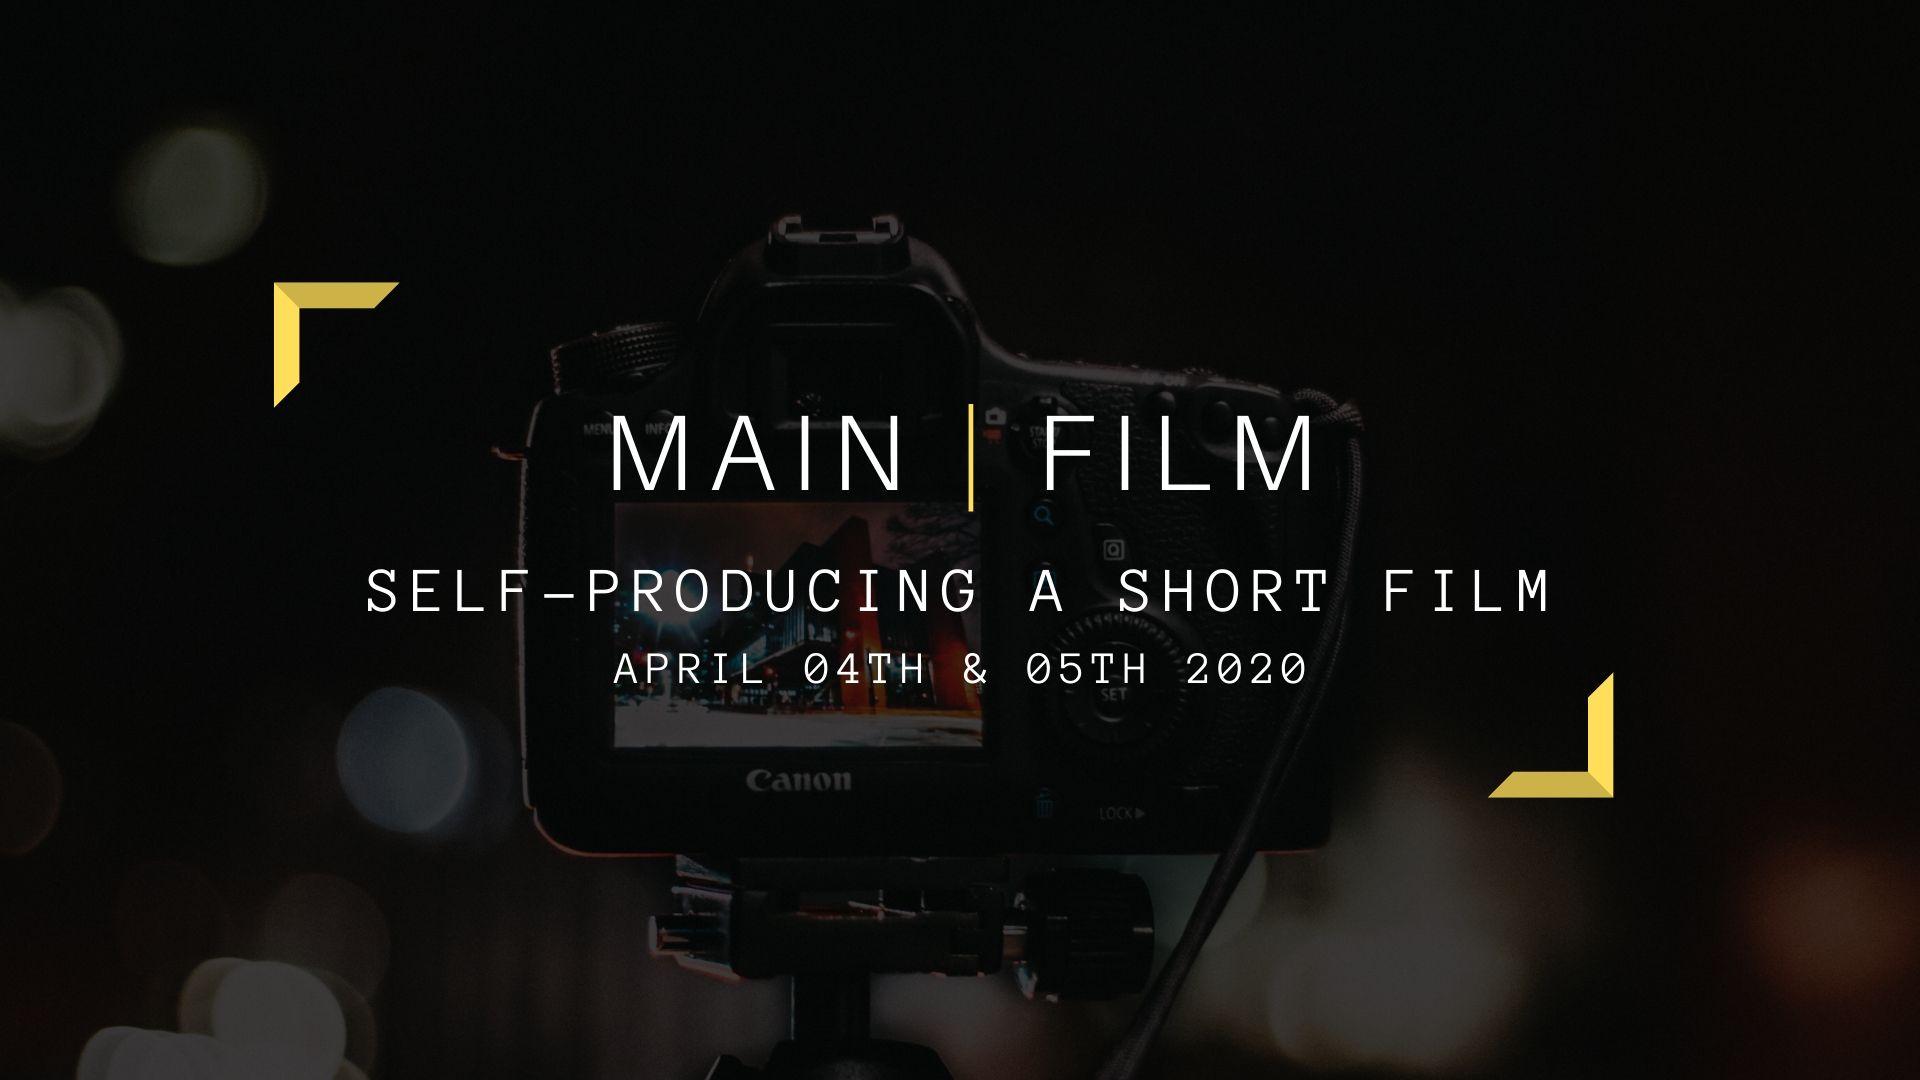 Self-producing a short film